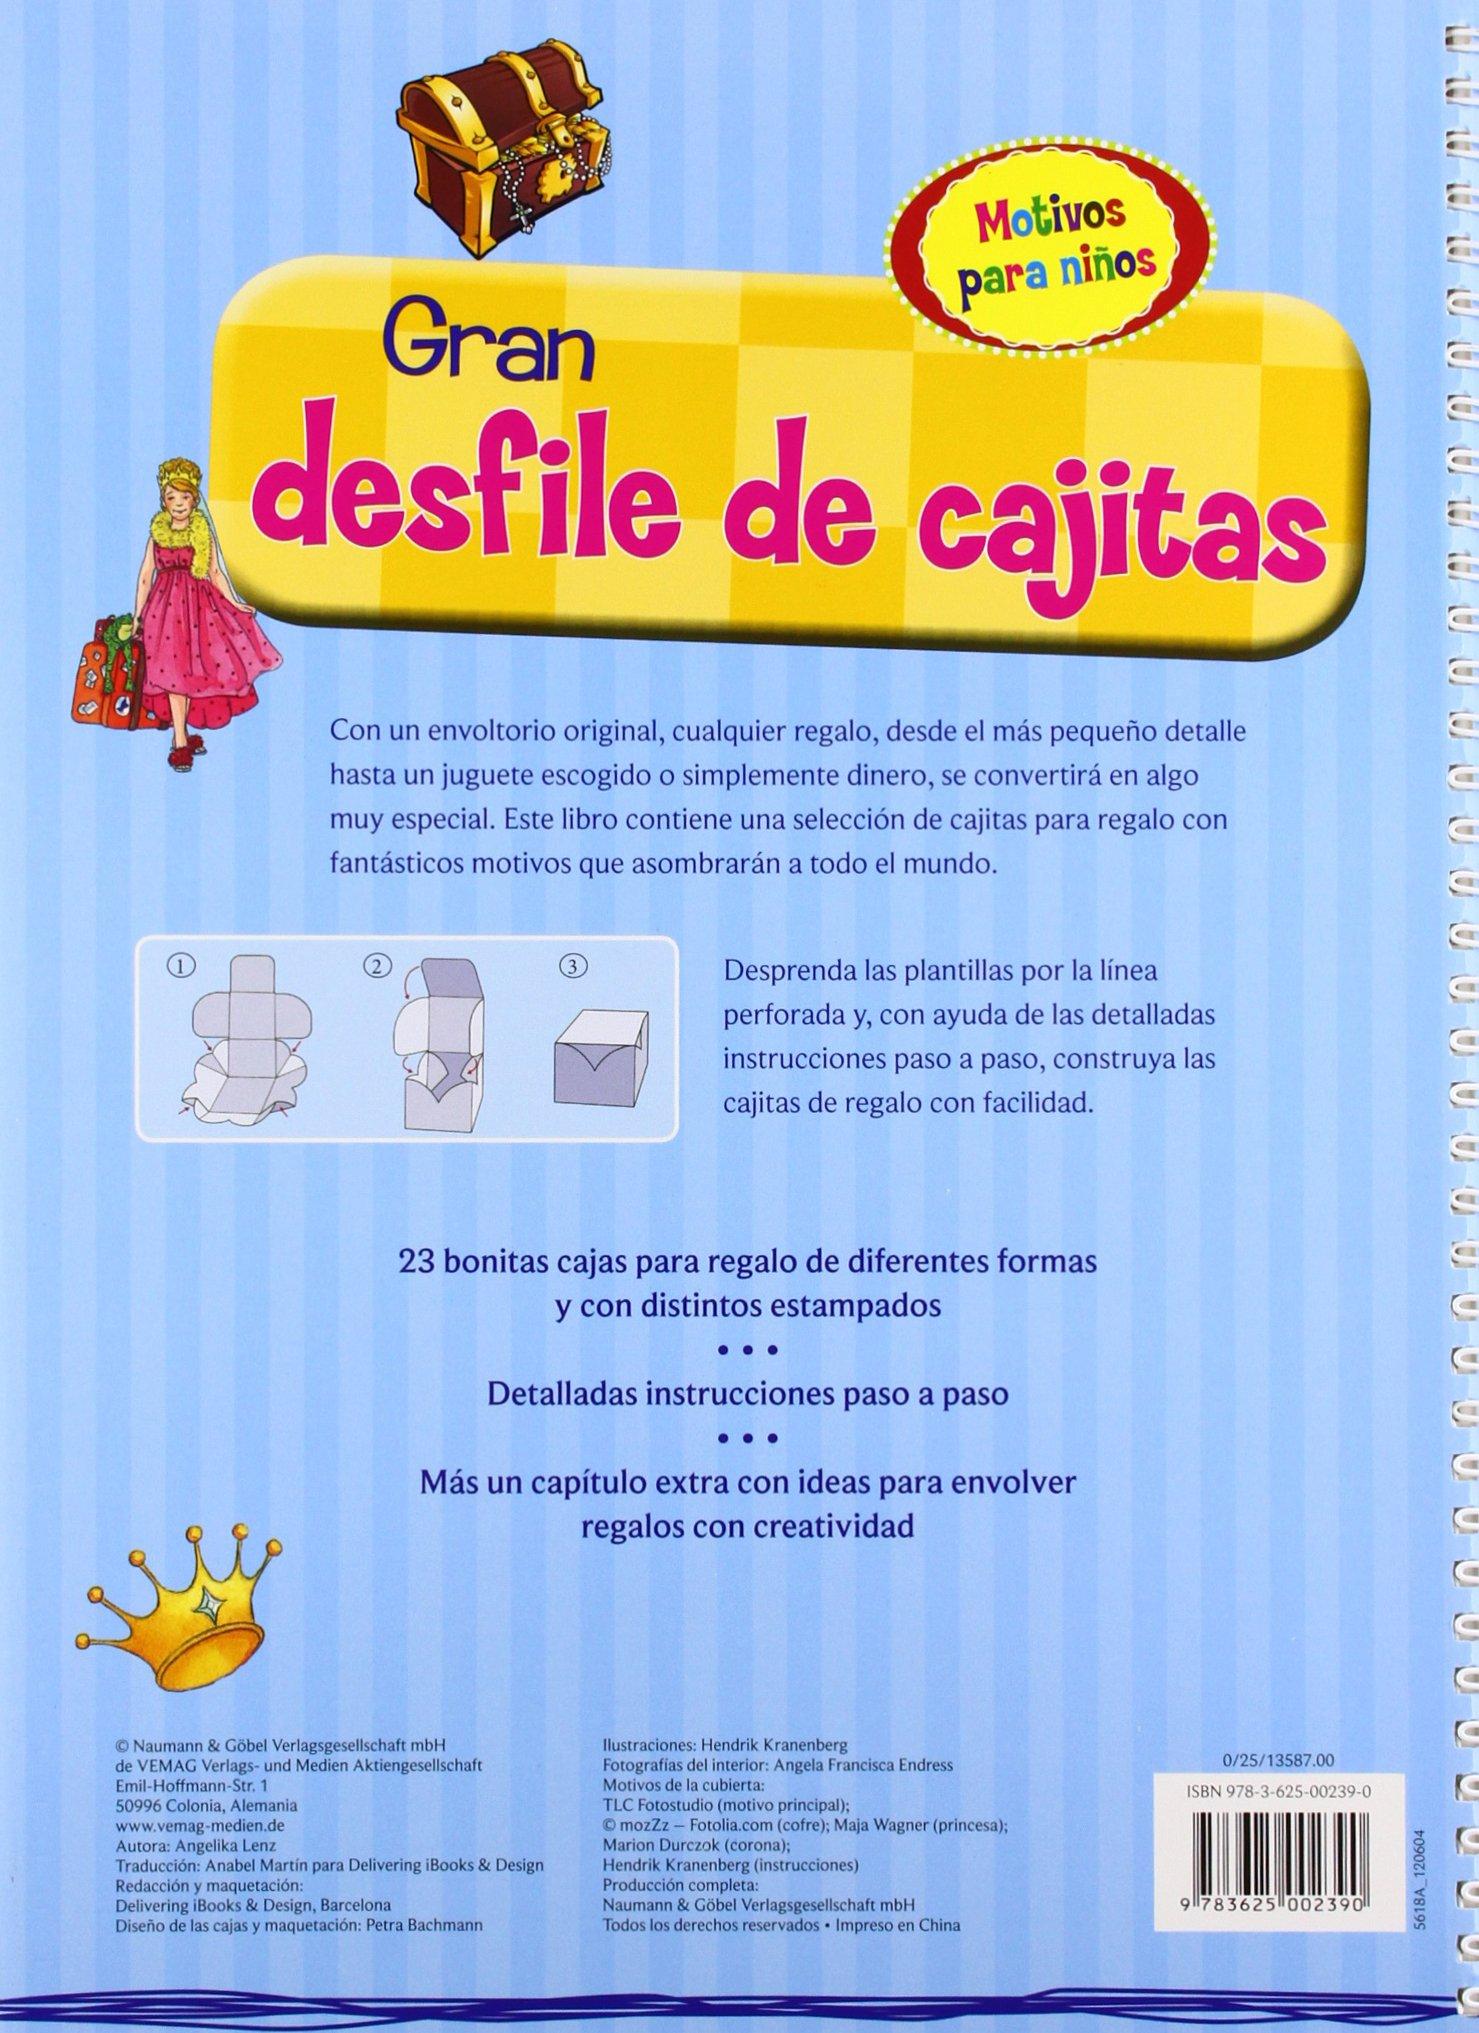 MOTIVOS PARA NIÑOS (GRAN DESFILE DE CAJITAS): Varios: 9783625002390: Amazon.com: Books